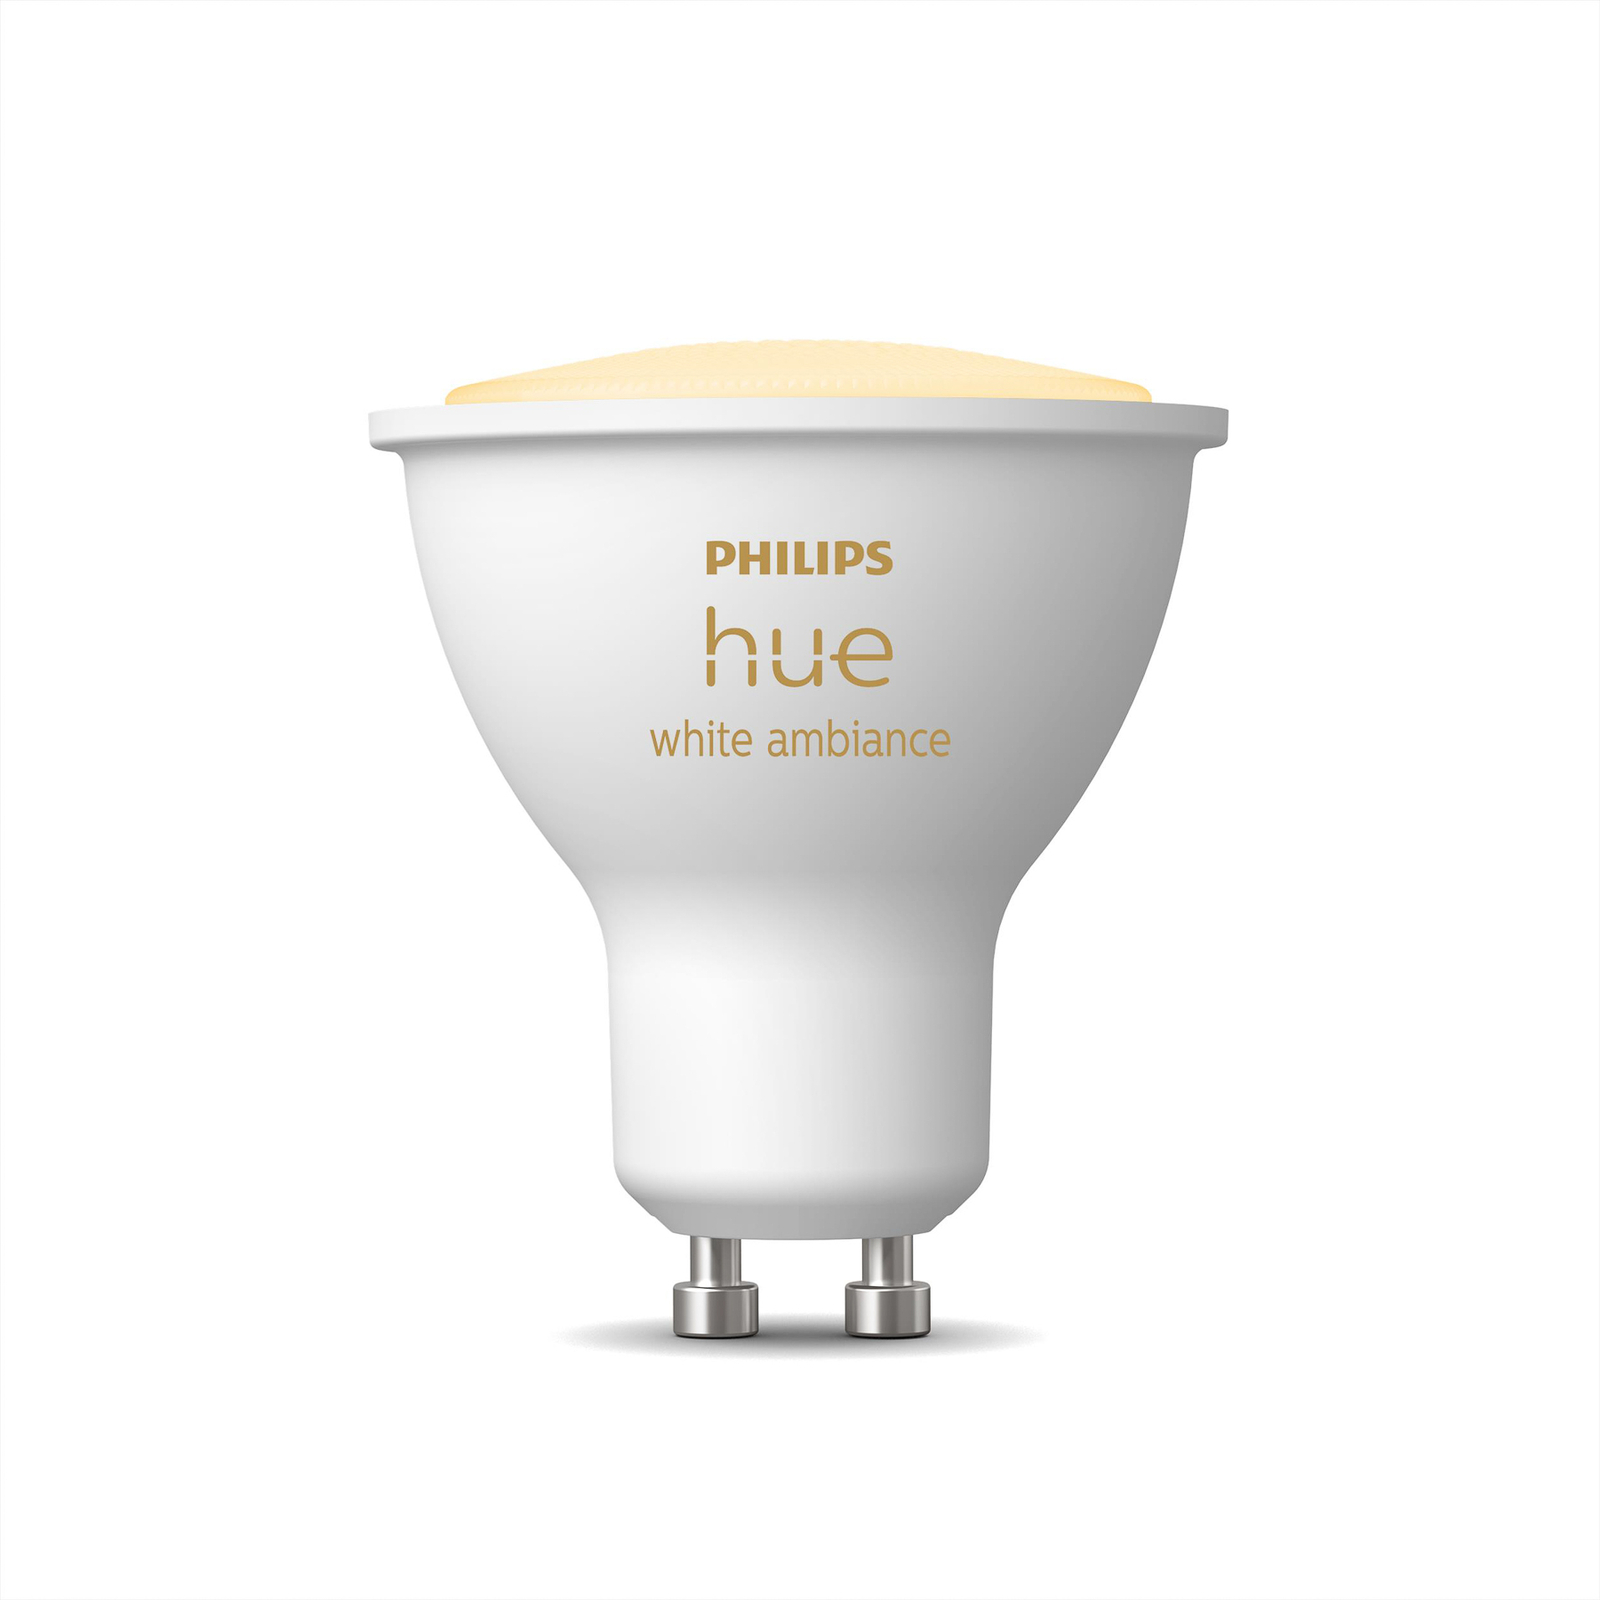 Philips Hue White Ambiance 4,3 W GU10 LED-Lampe